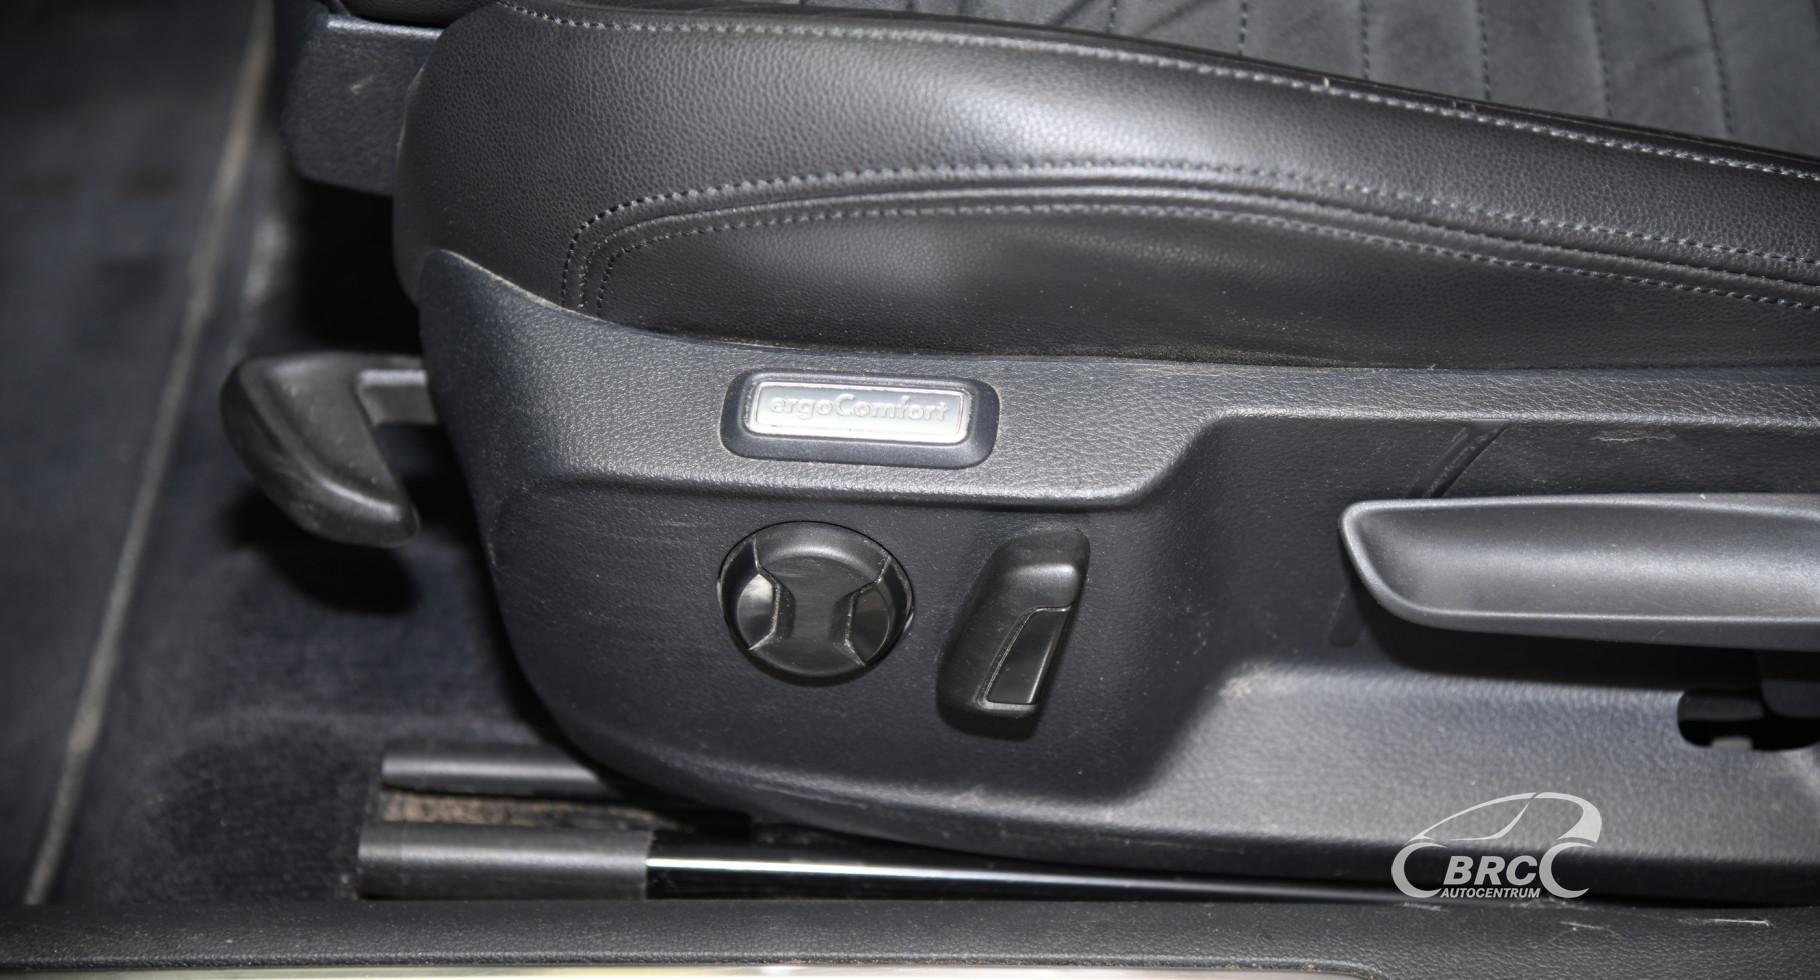 Volkswagen Passat 2.0 TDI DSG Highline Automatas